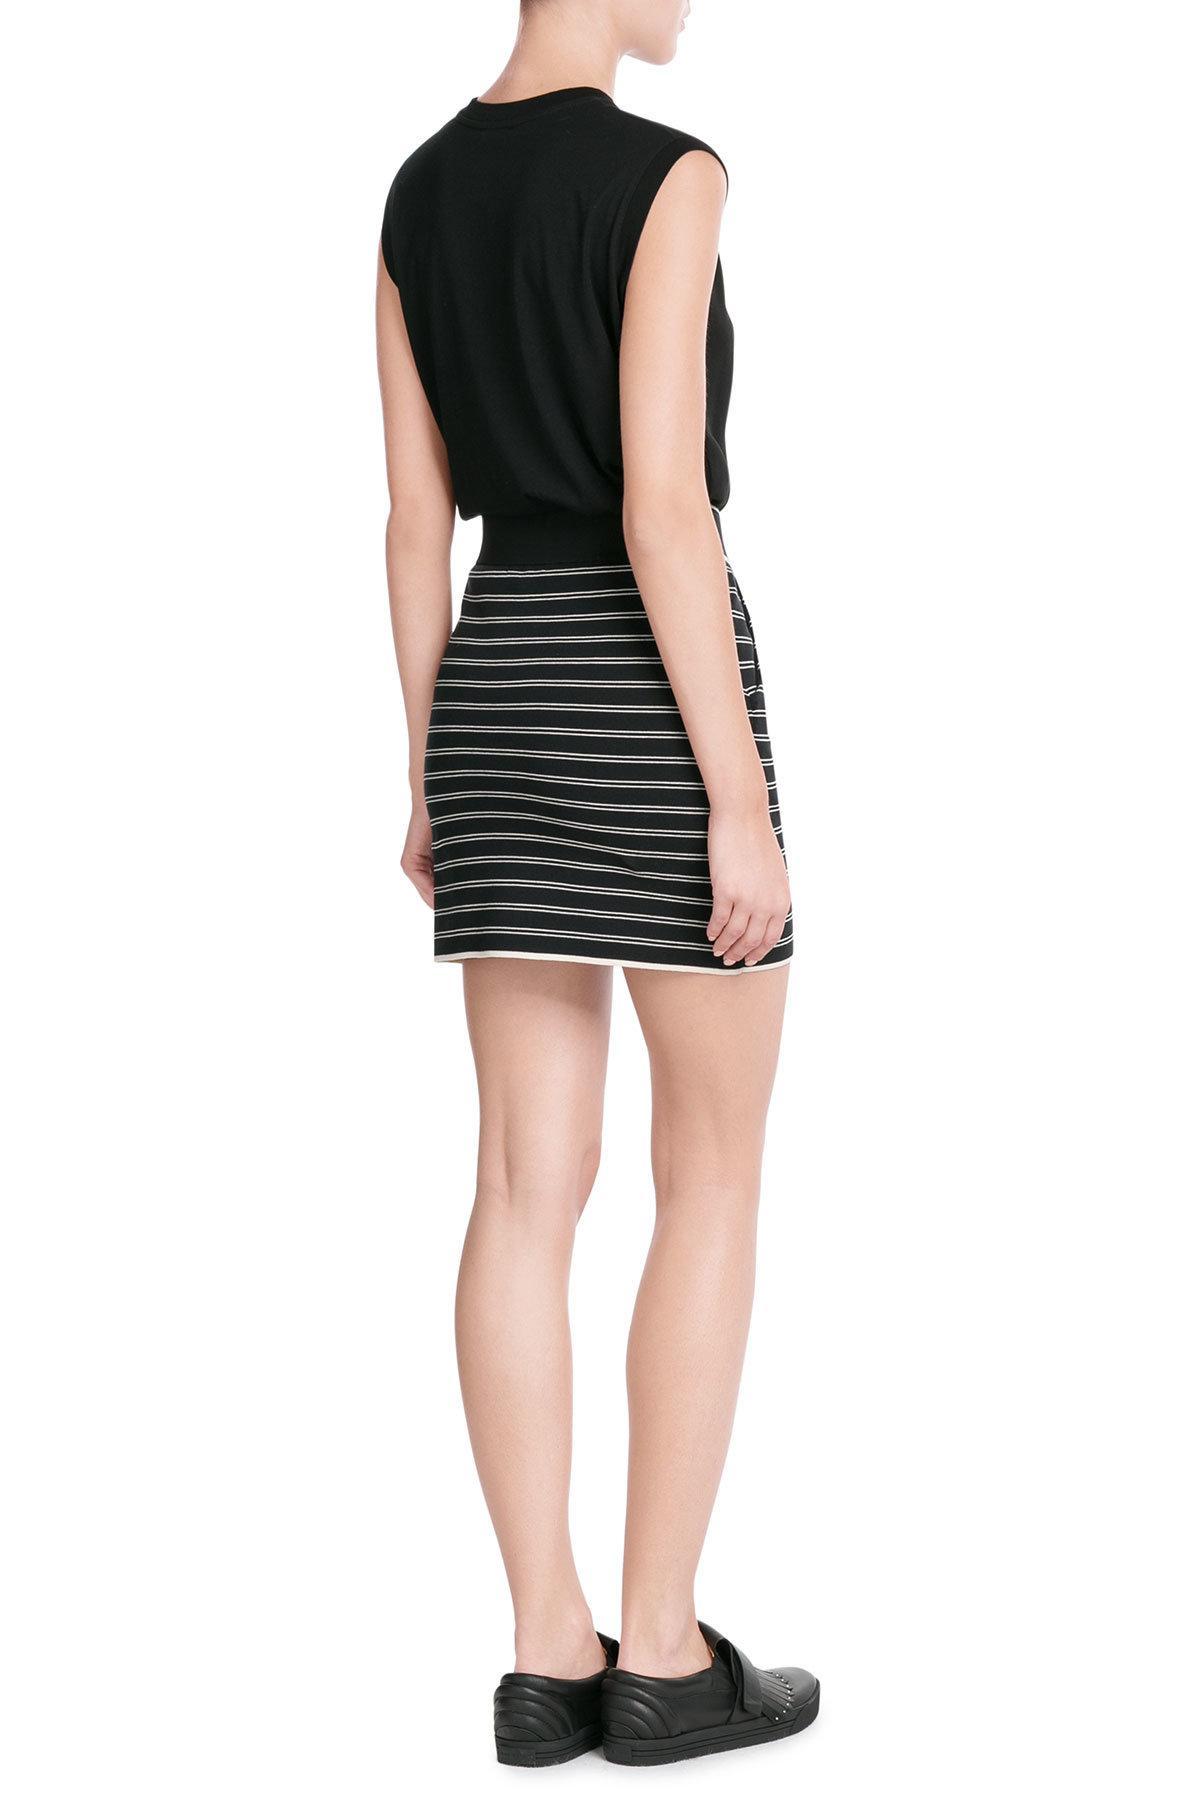 bridget regan mini skirt